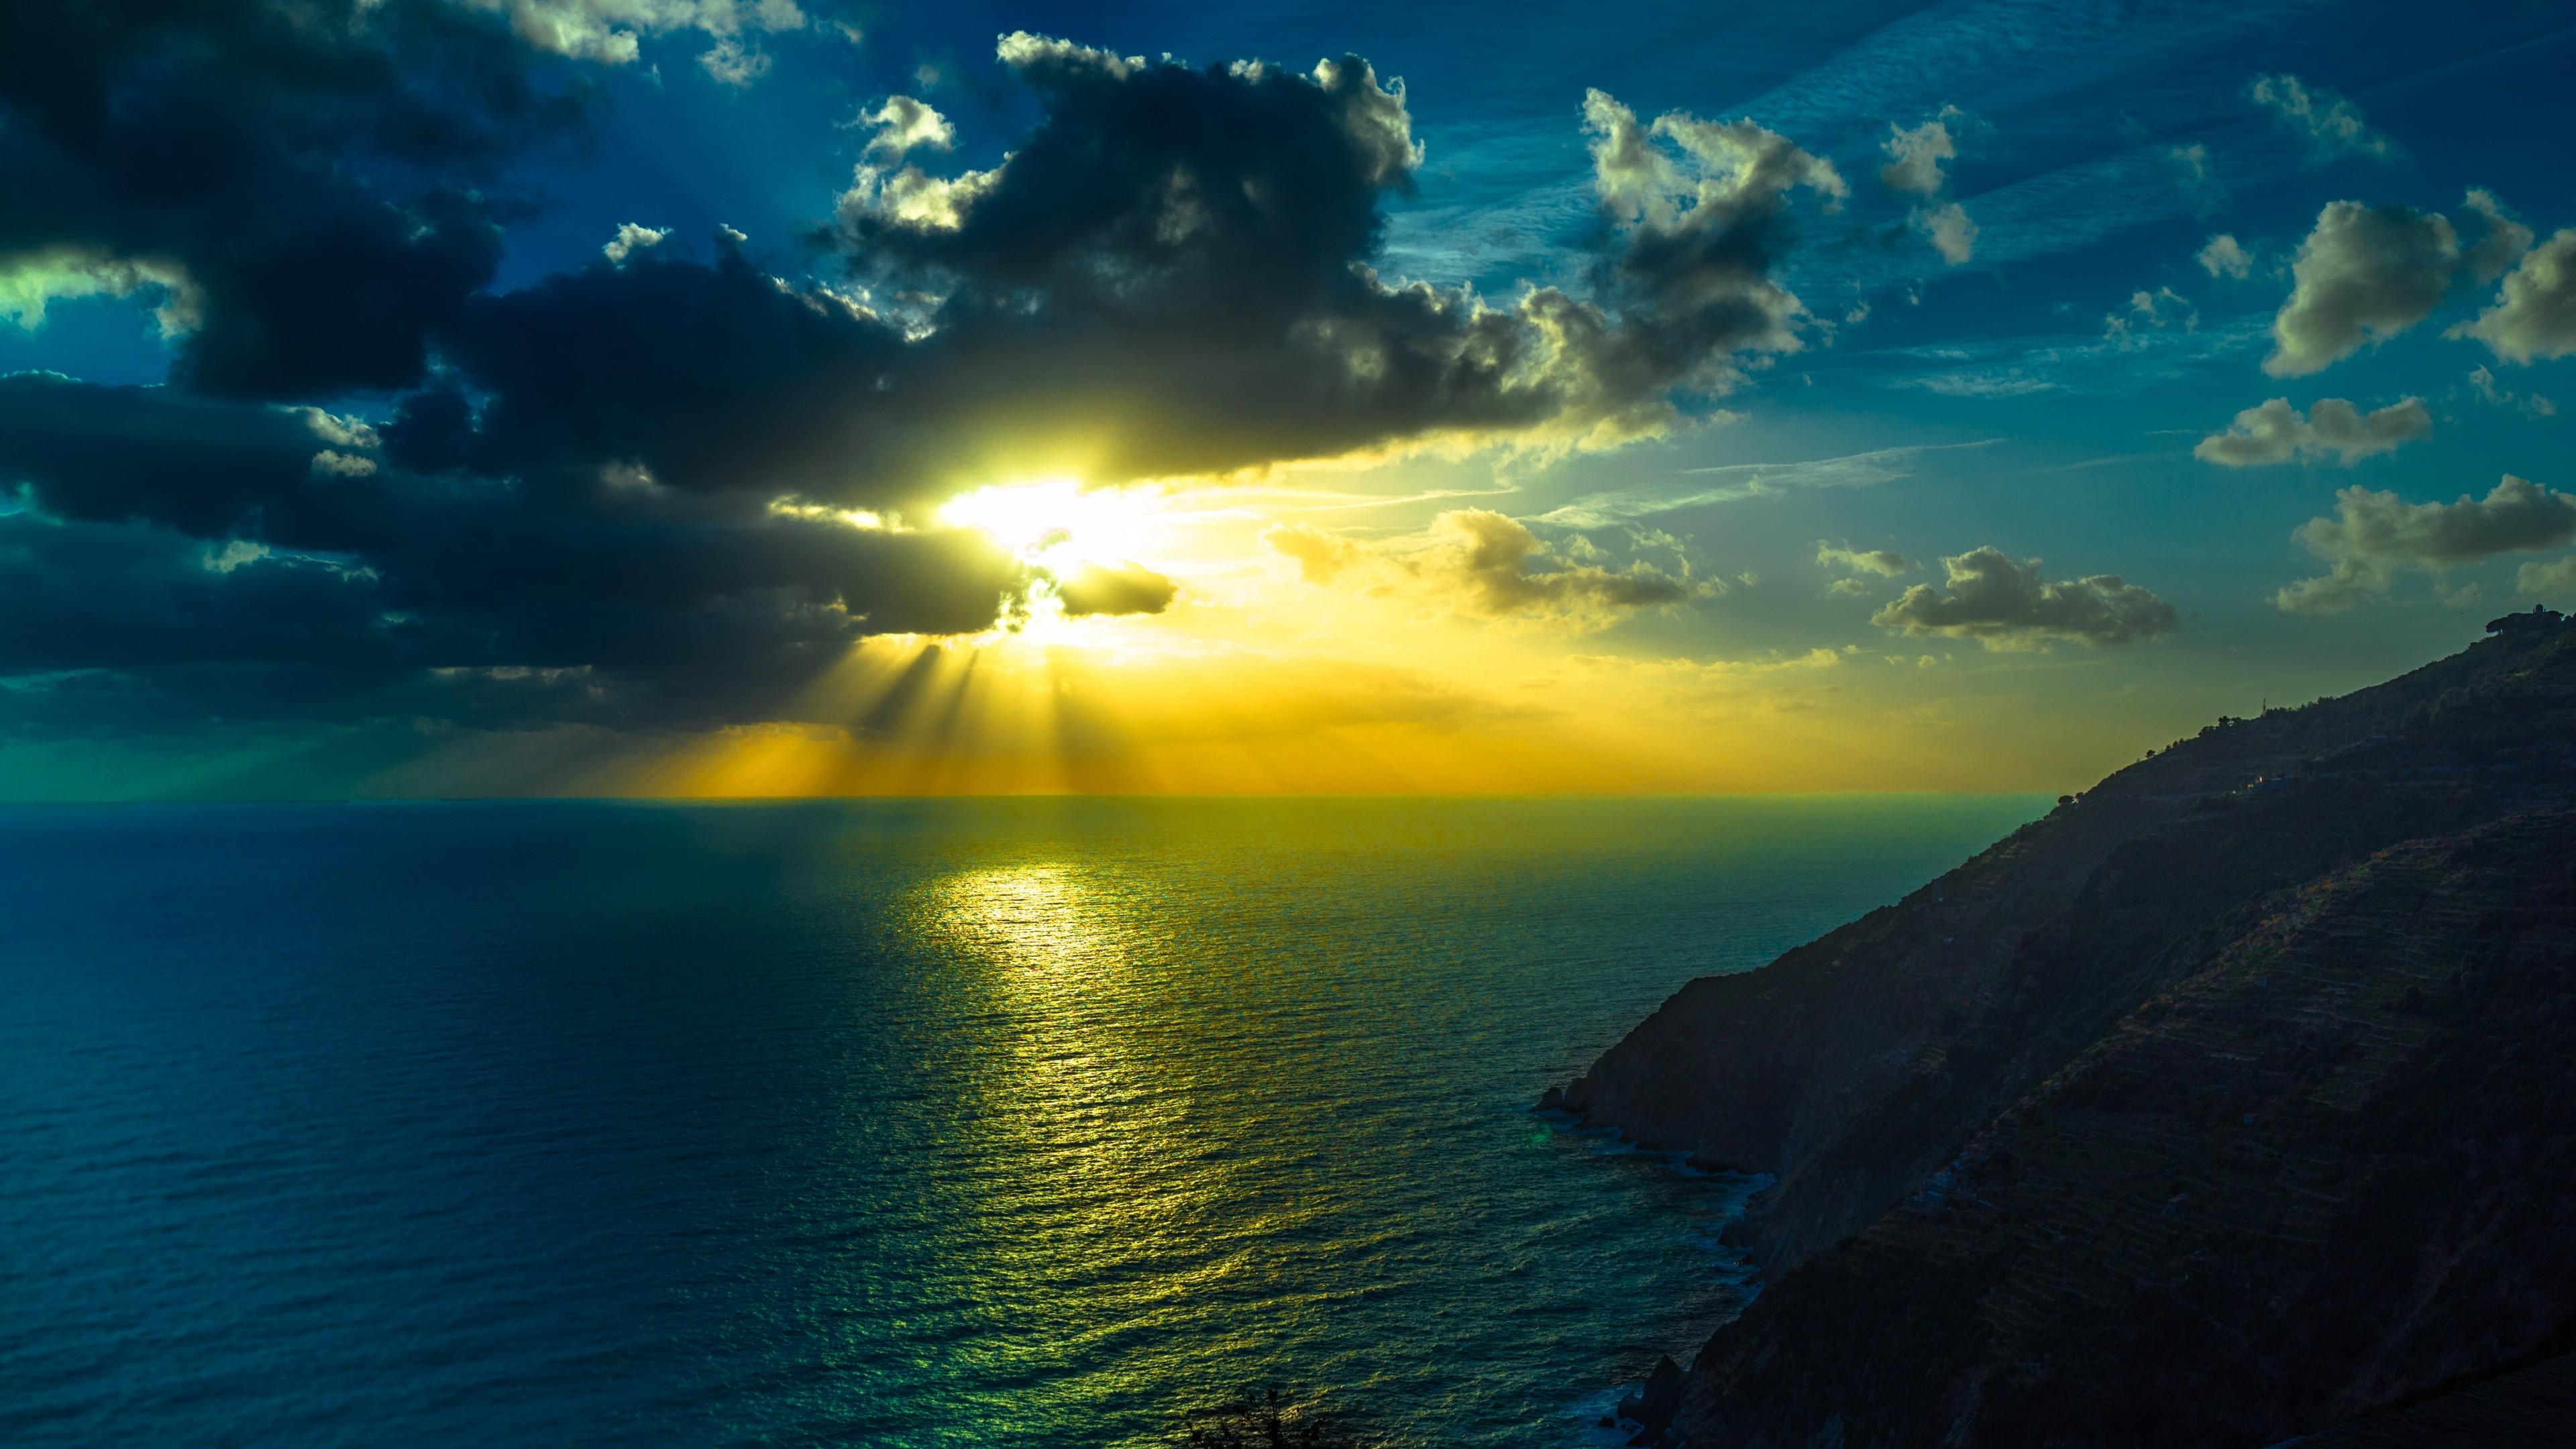 HD-Wallpaper-3840×2160-mountains-sea-ocean-clouds-night-